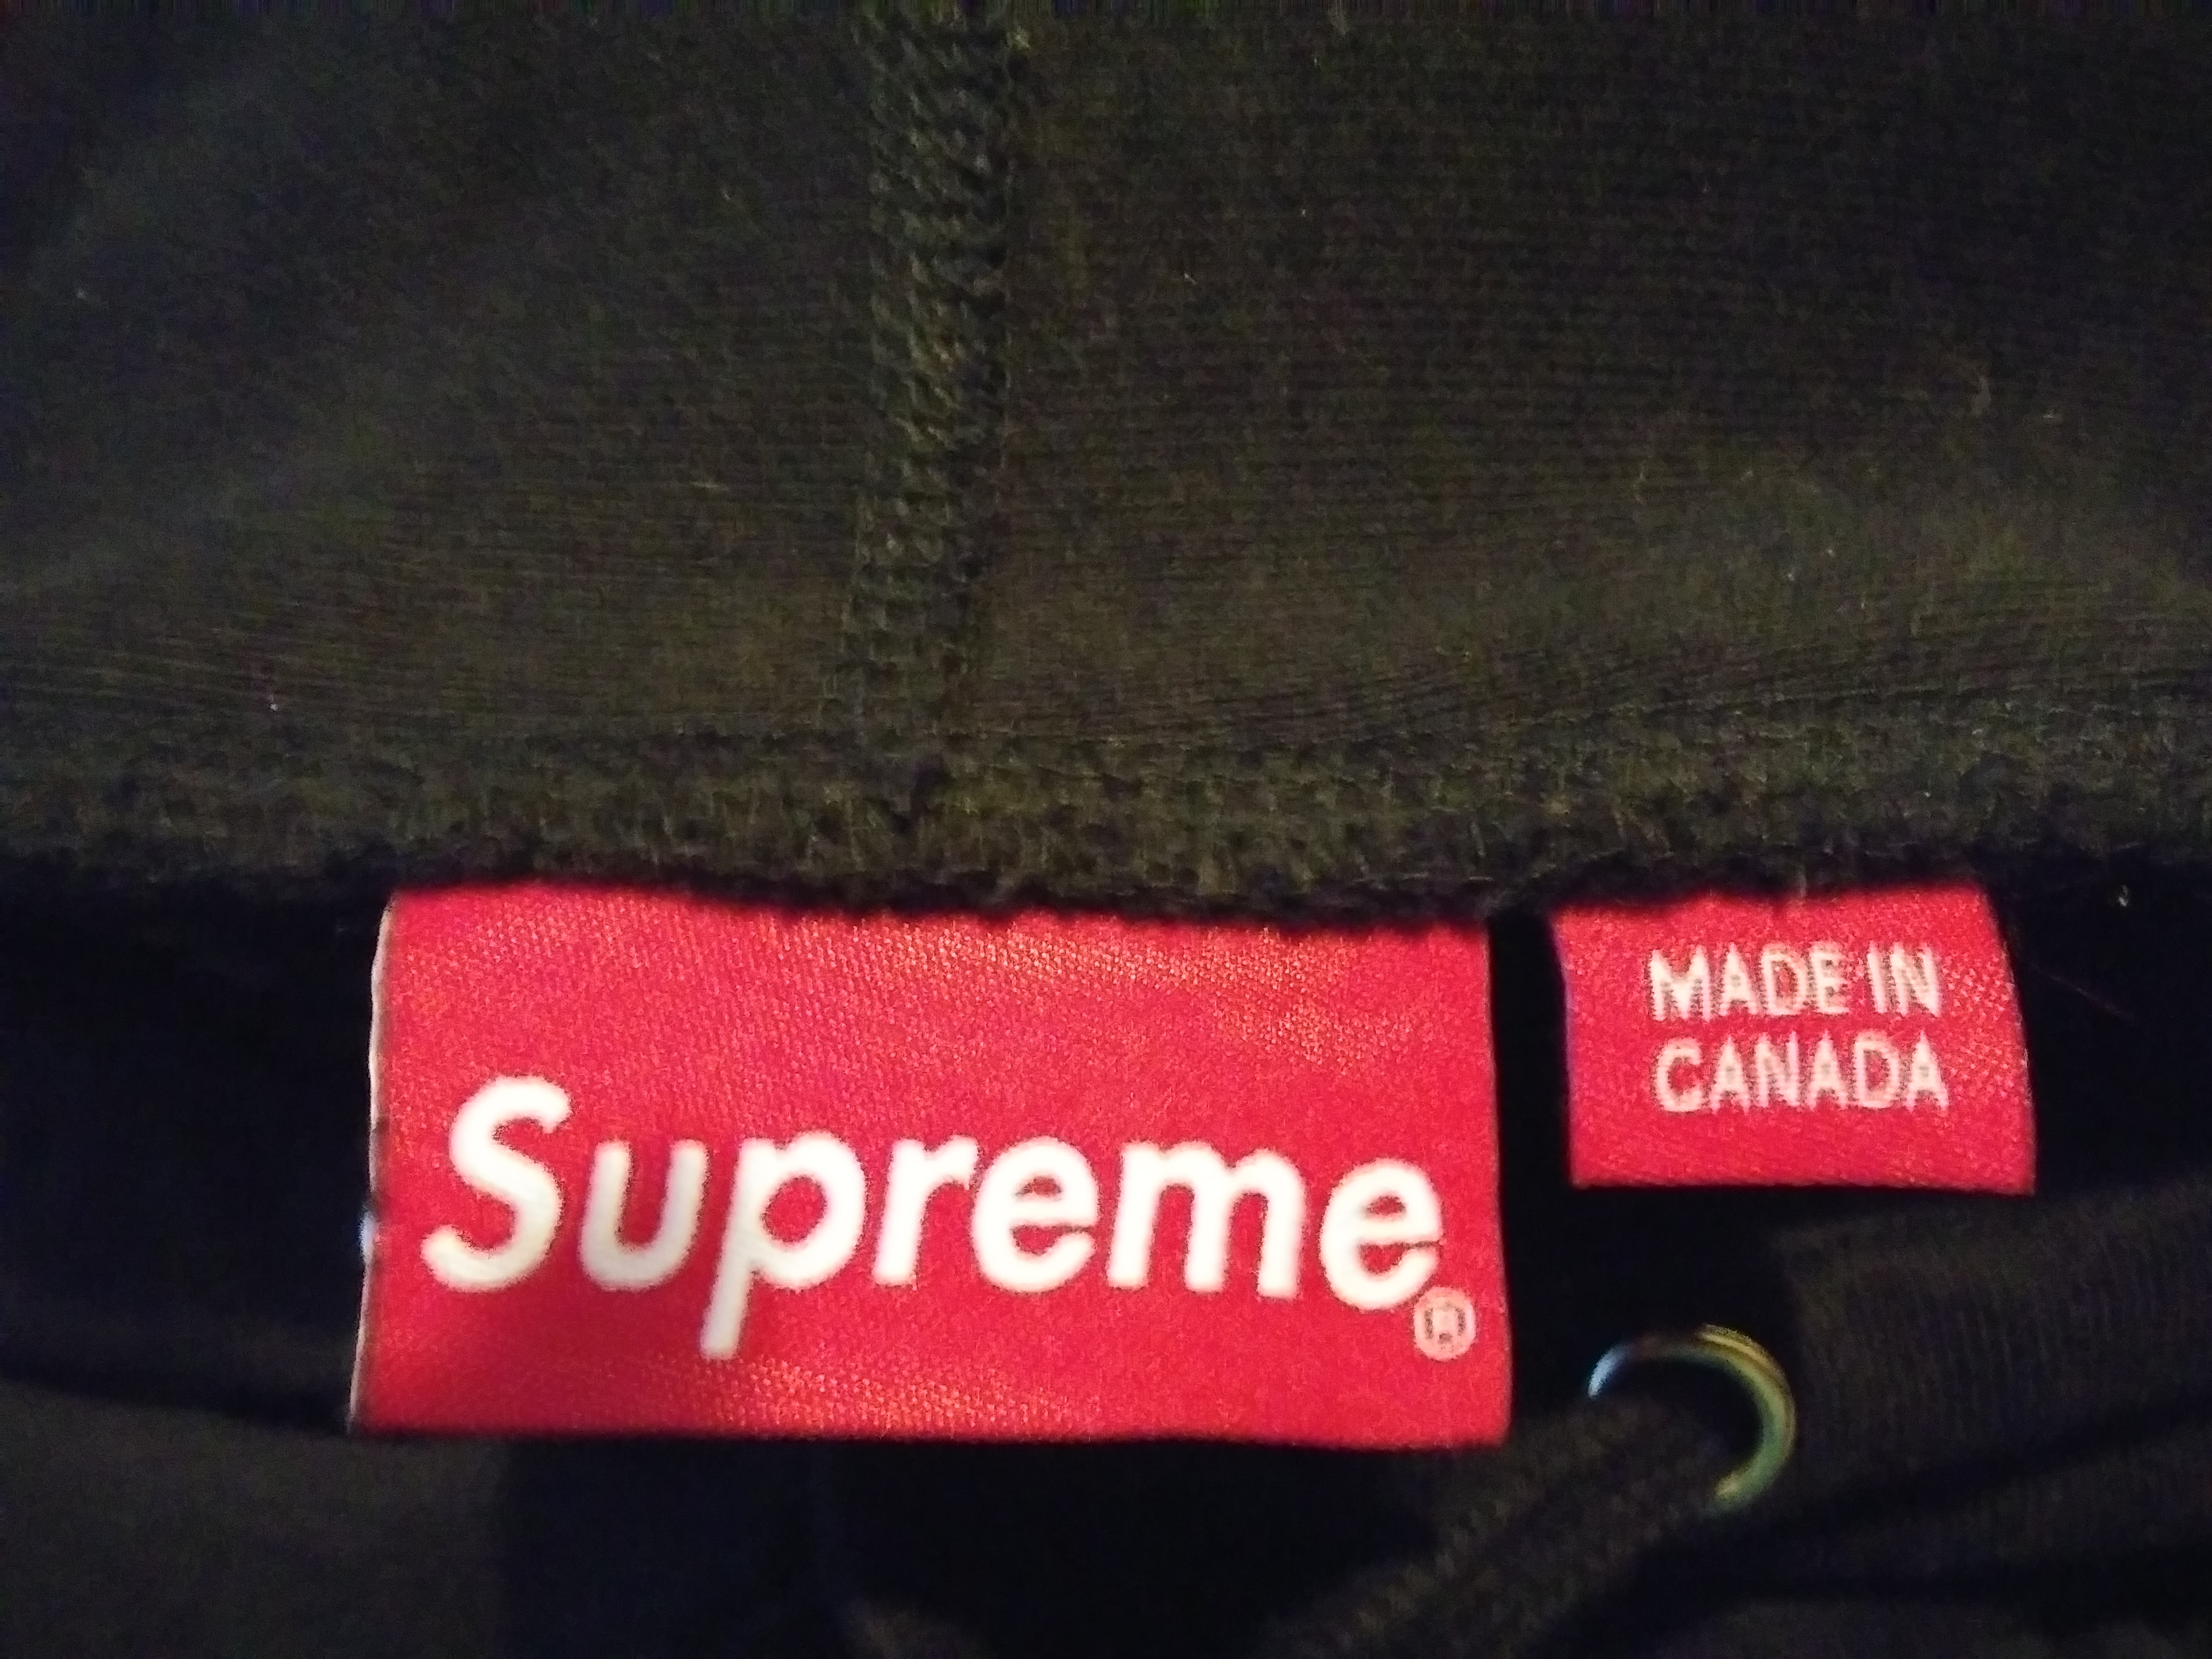 e01f59dc5474 Legit Check supreme hoodie - The eBay Community